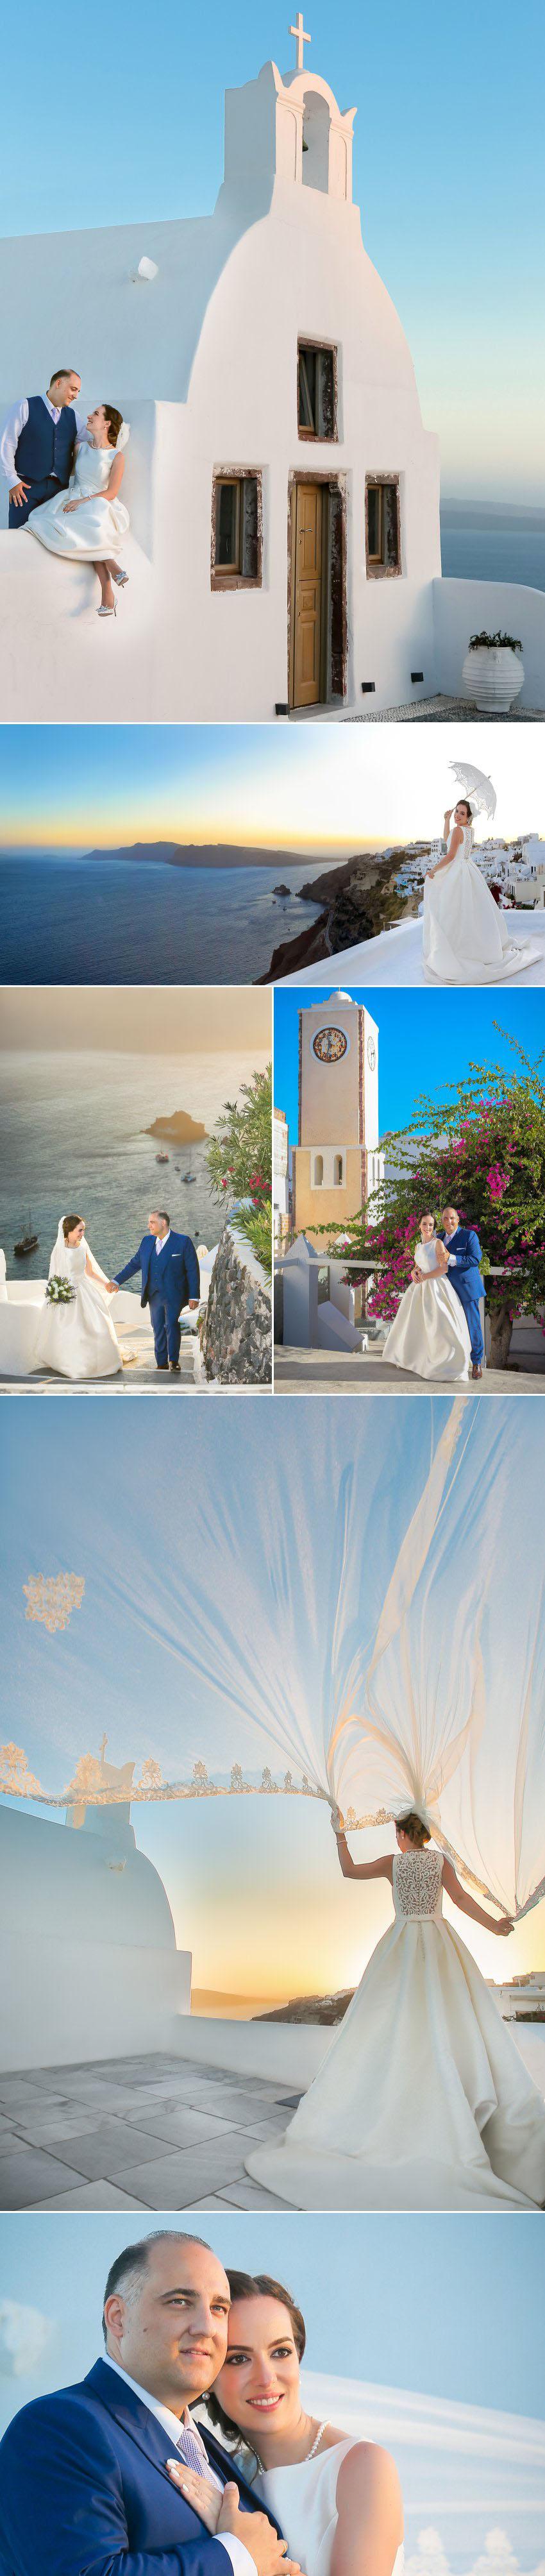 24_Destination wedding videography